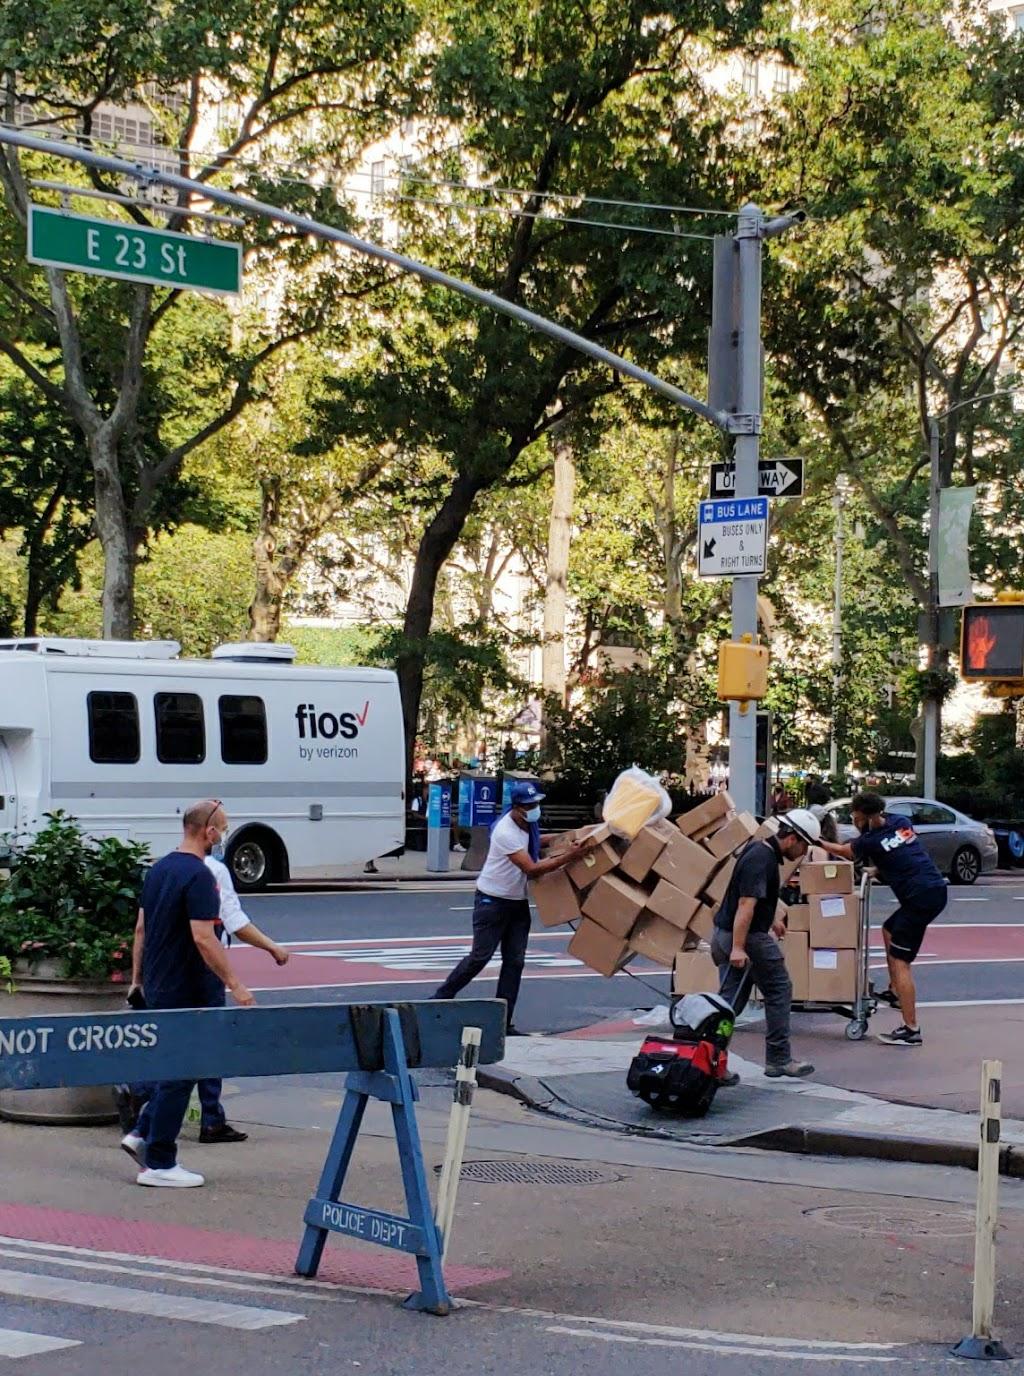 FedEx Ground - moving company  | Photo 4 of 7 | Address: 300 Maspeth Ave, Brooklyn, NY 11211, USA | Phone: (800) 463-3339